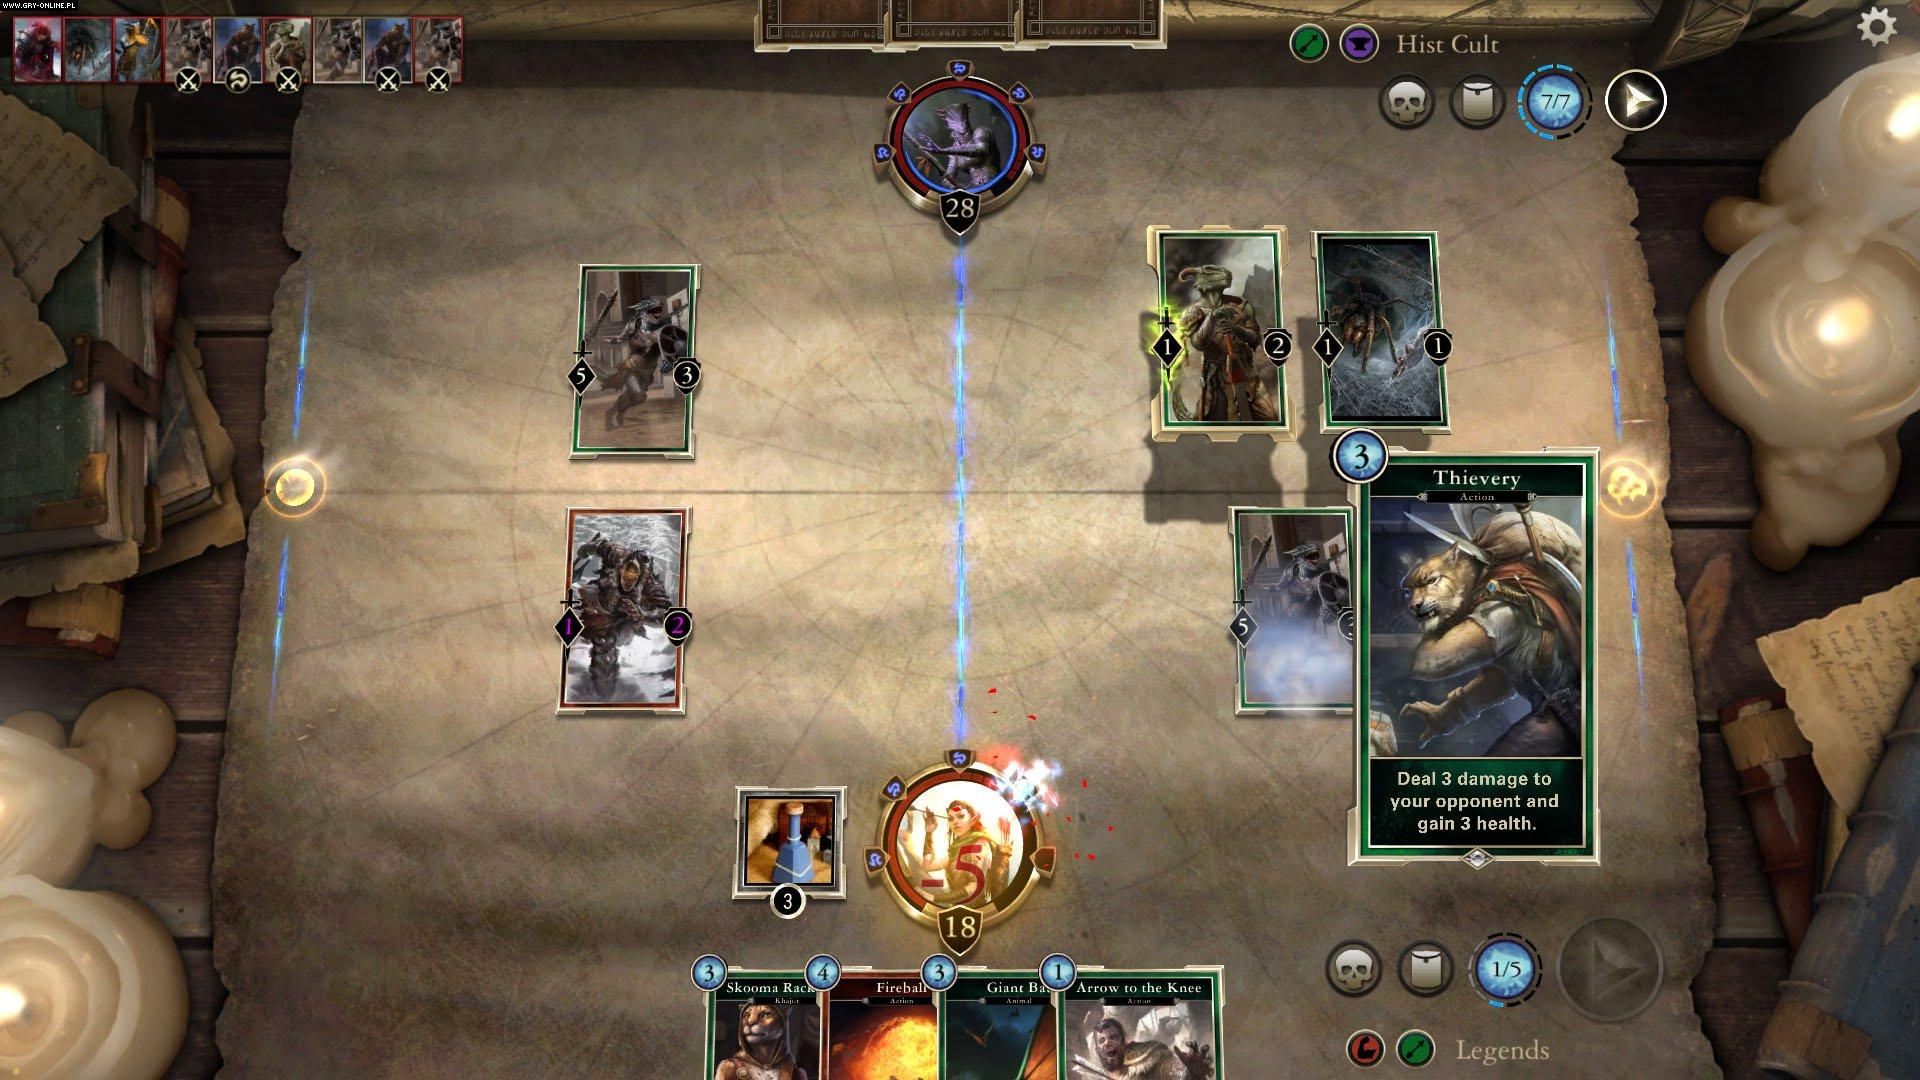 The Elder Scrolls: Legends PC, iOS Games Image 6/6, Bethesda Softworks